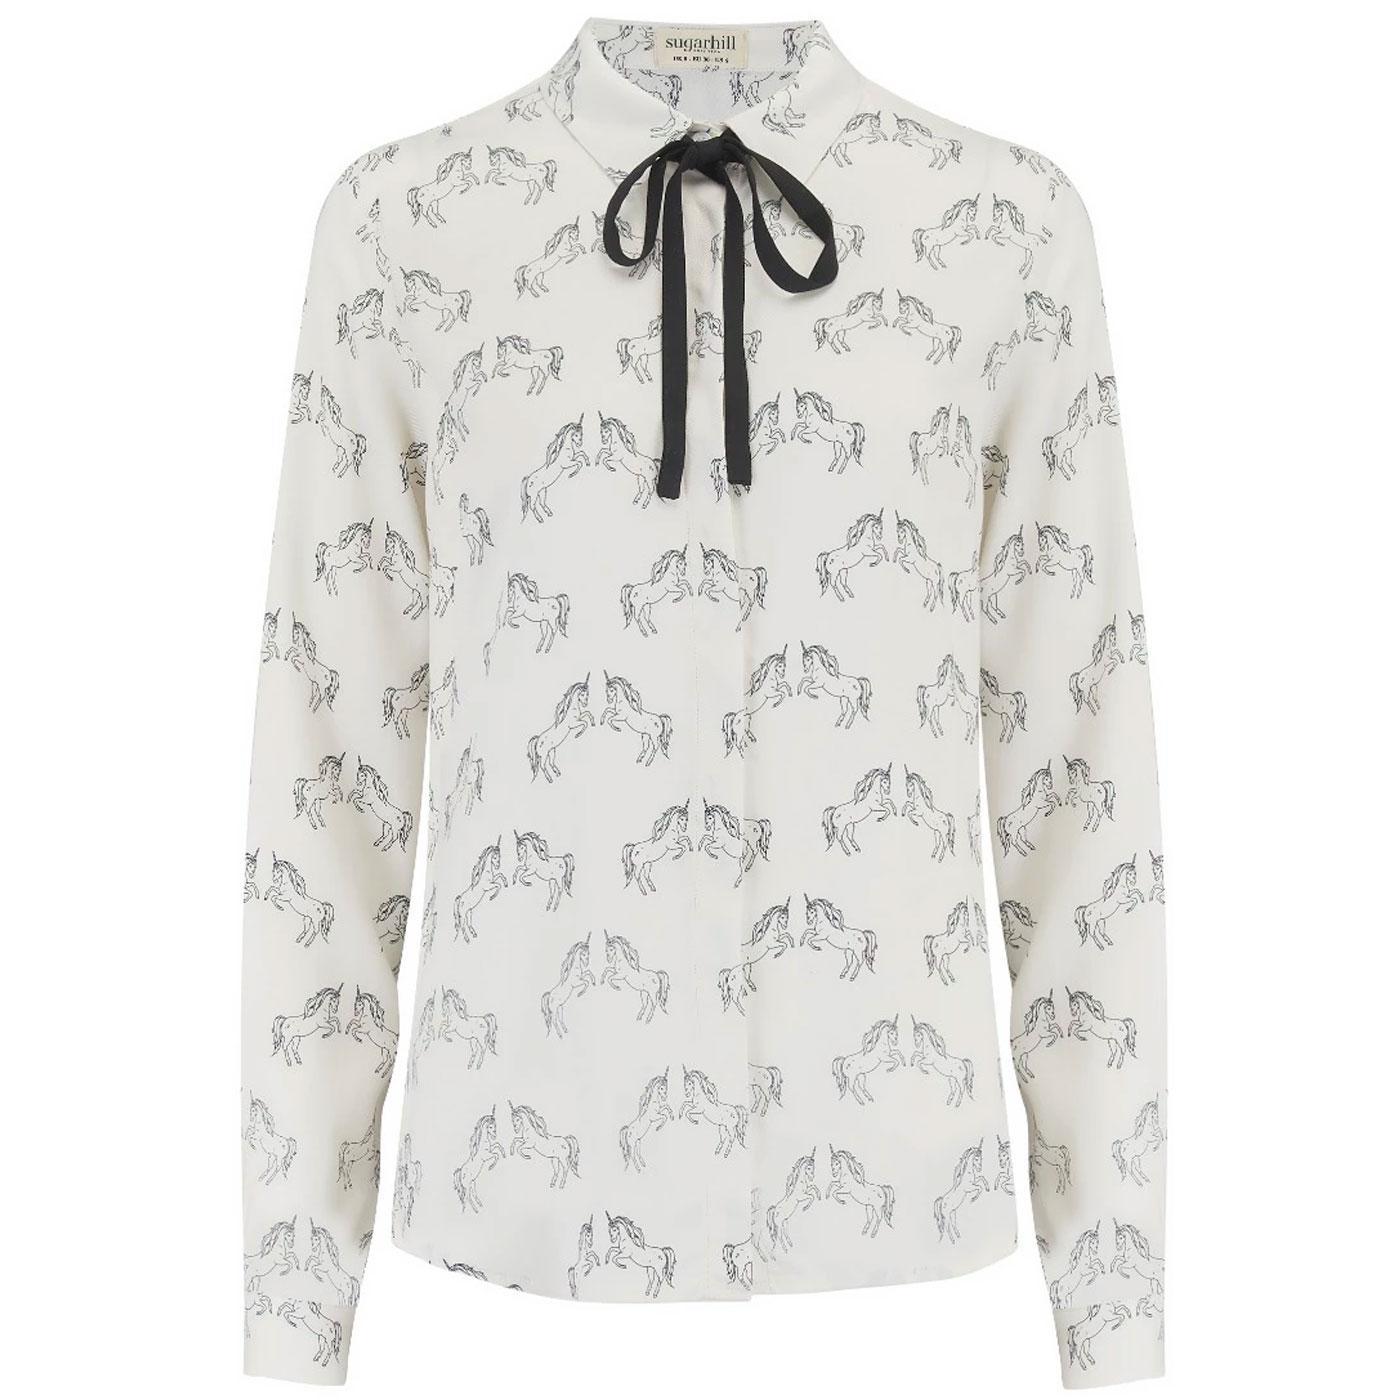 Catrina SUGARHILL BRIGHTON Unicorn Sketch Shirt